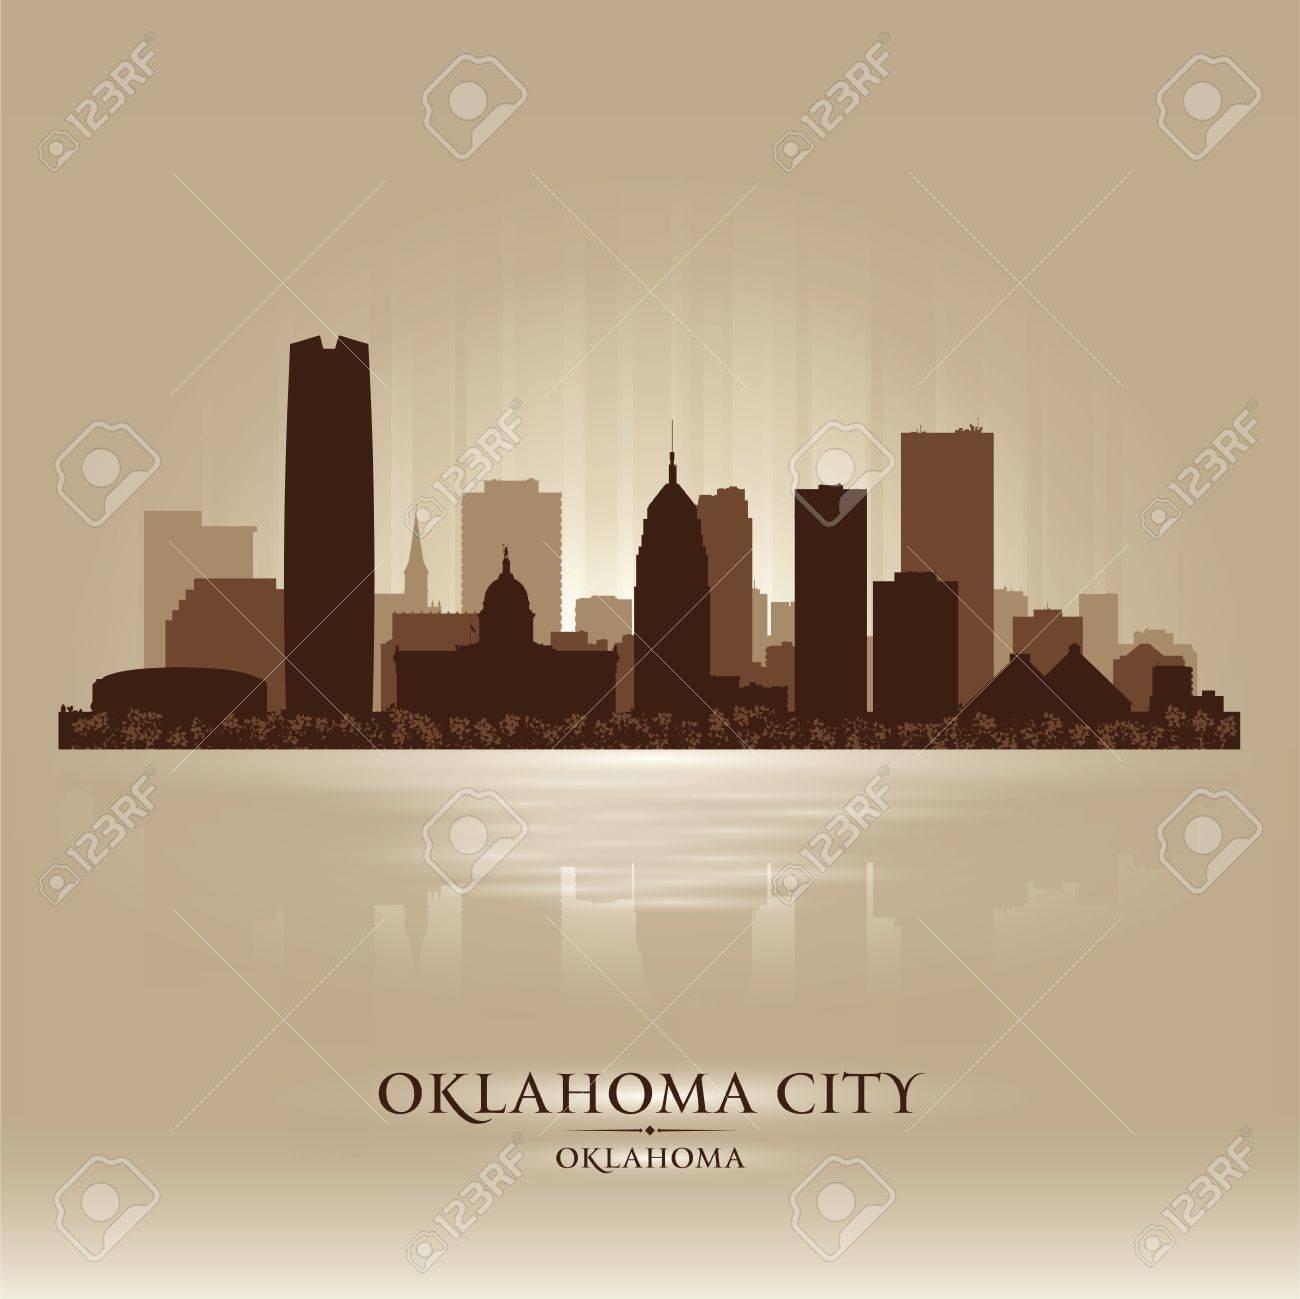 Oklahoma City skyline silhouette Stock Vector - 17598755